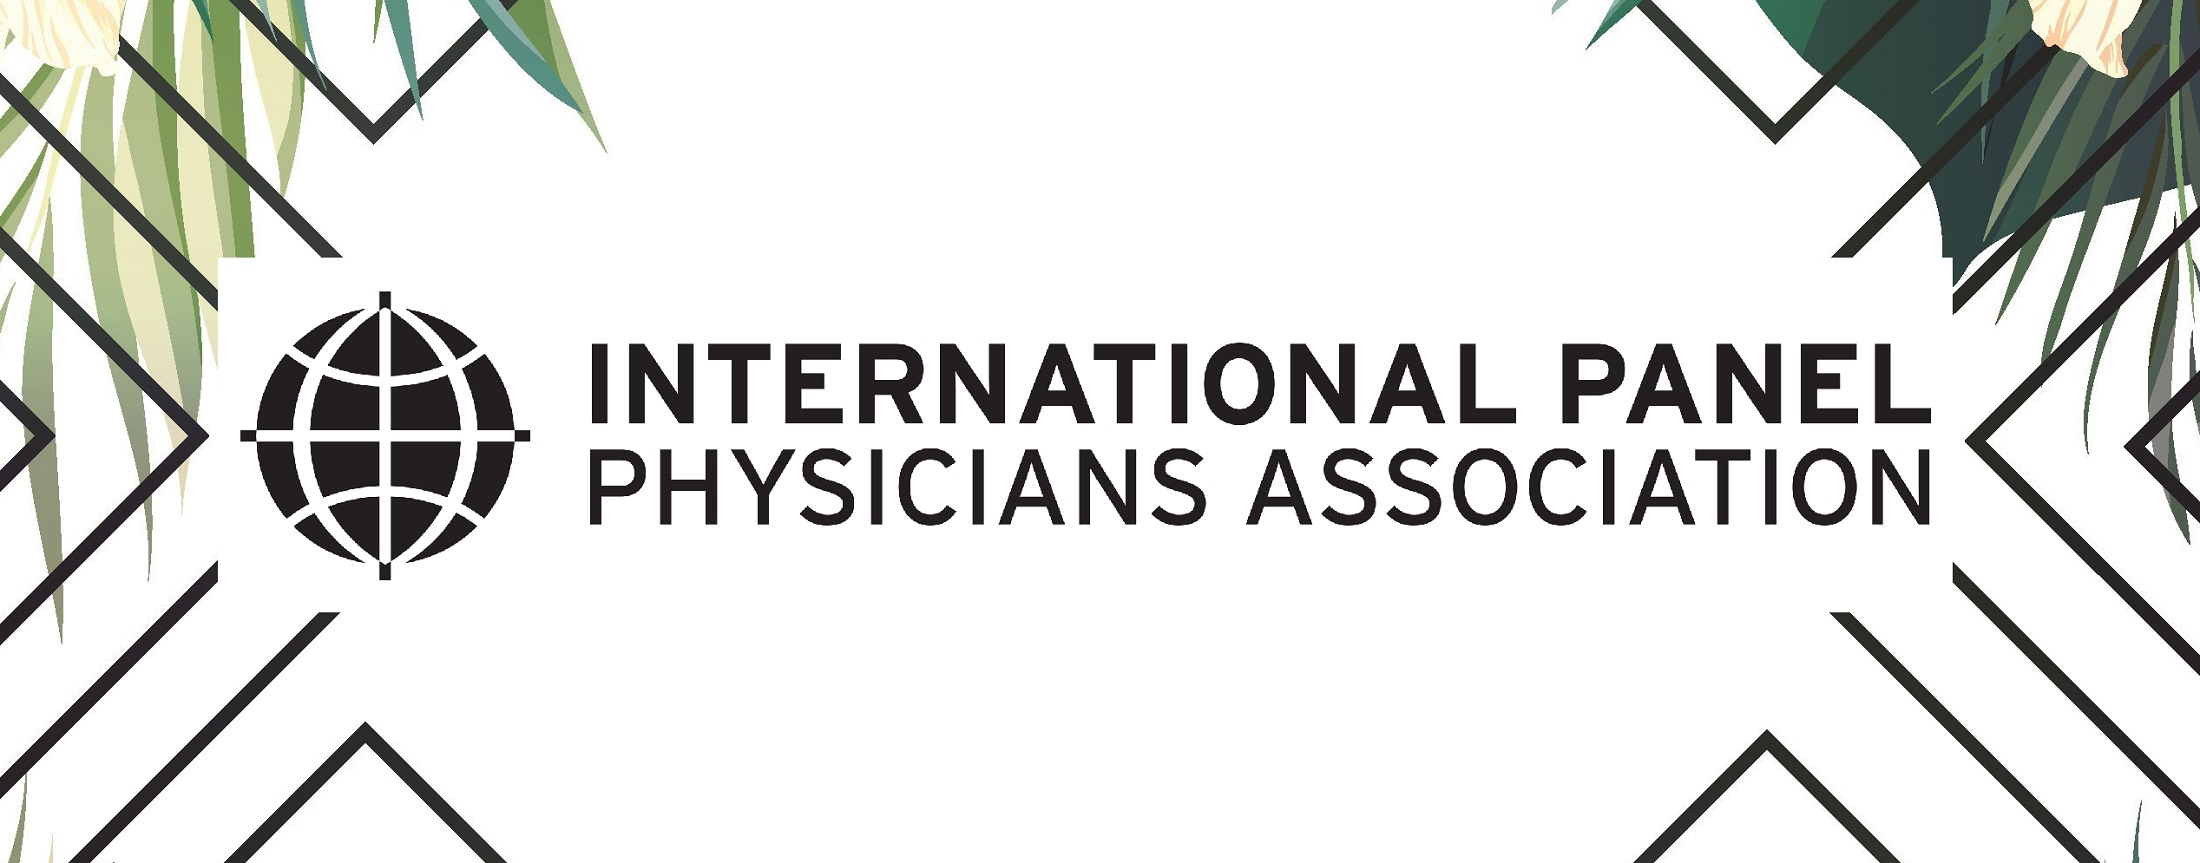 Intergovernmental Panel Physician Training Summit, March 27-31, 2017